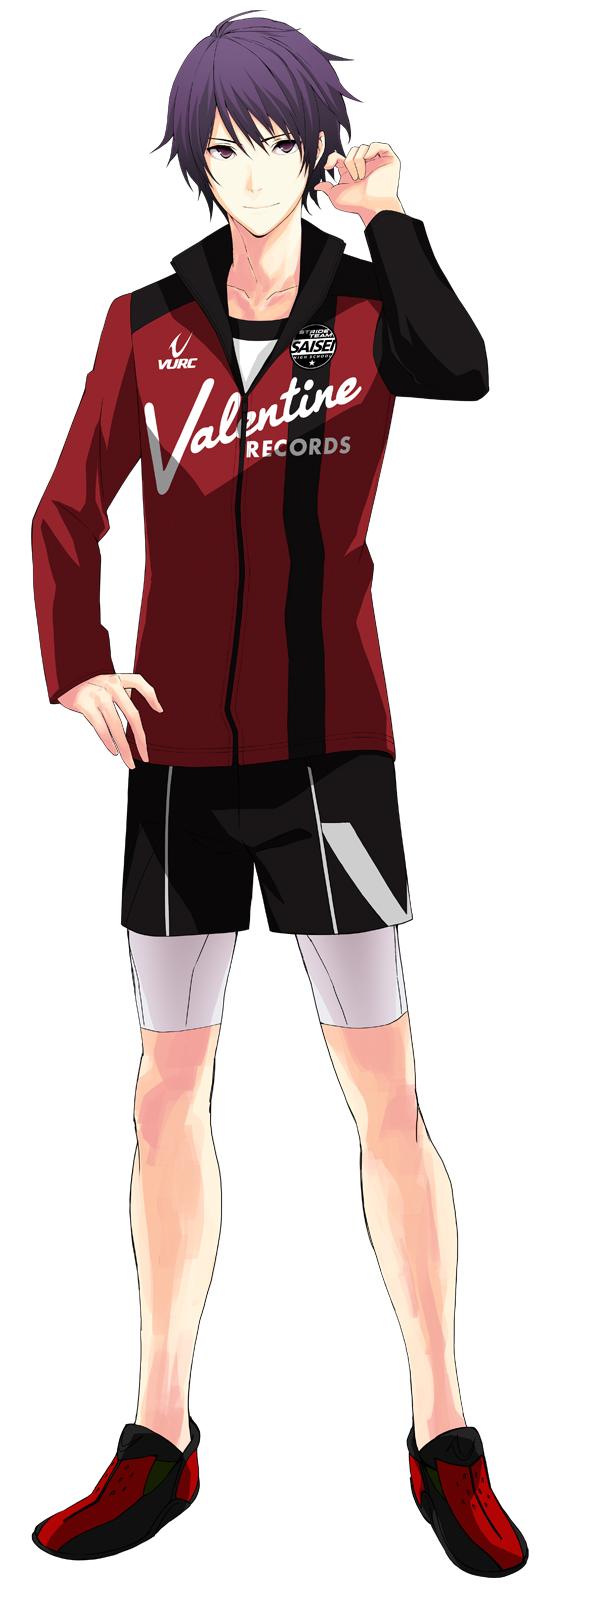 Tags: Anime, Nono Kanako, PRINCE OF STRIDE, Suwa Reiji, PNG Conversion, Official Art